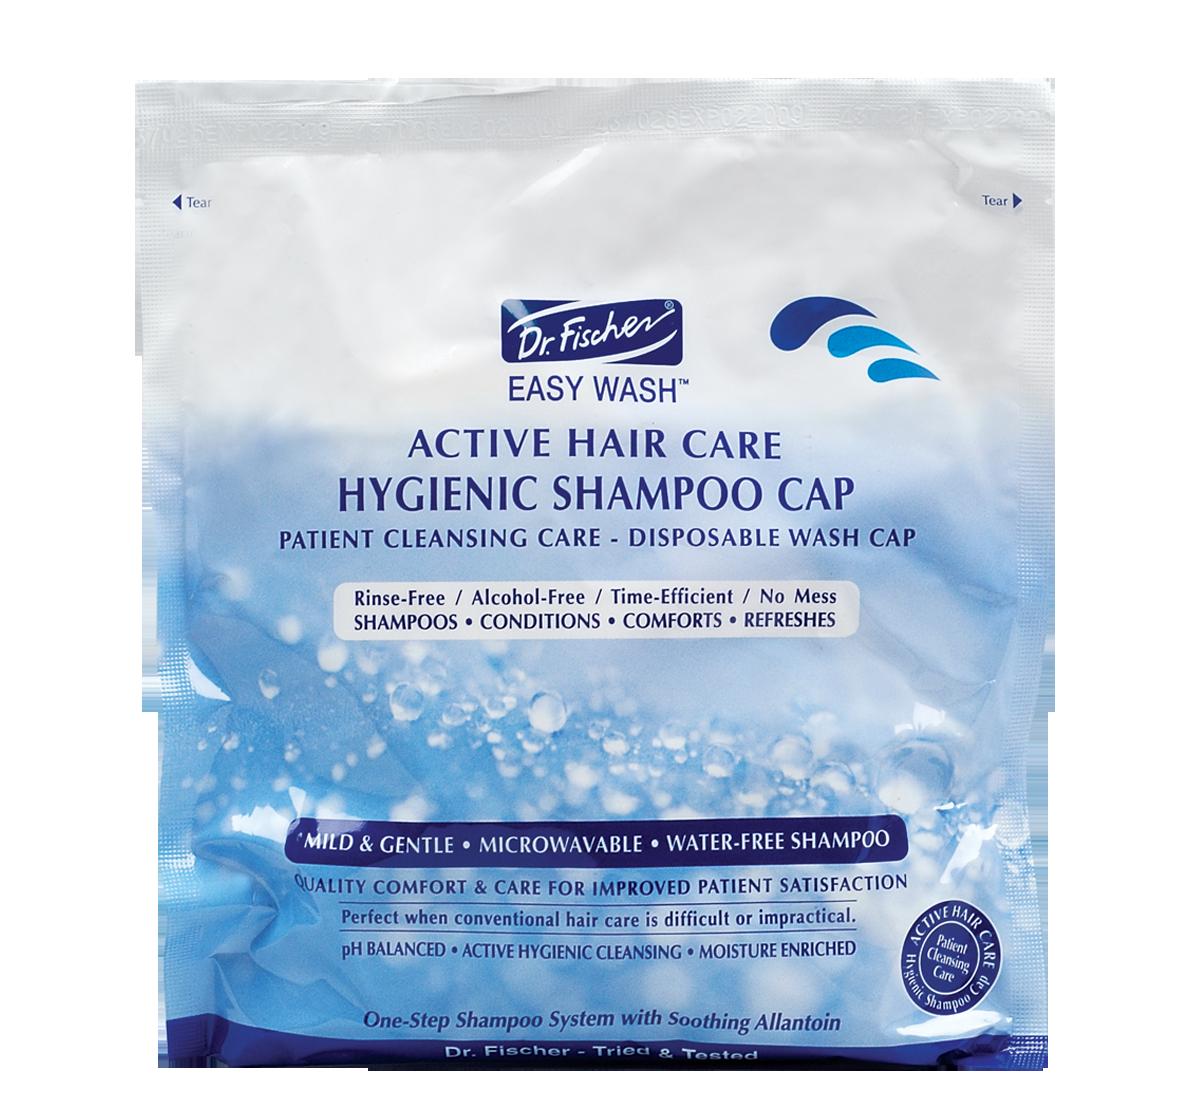 E_easy-wash_shampoo1184x1104